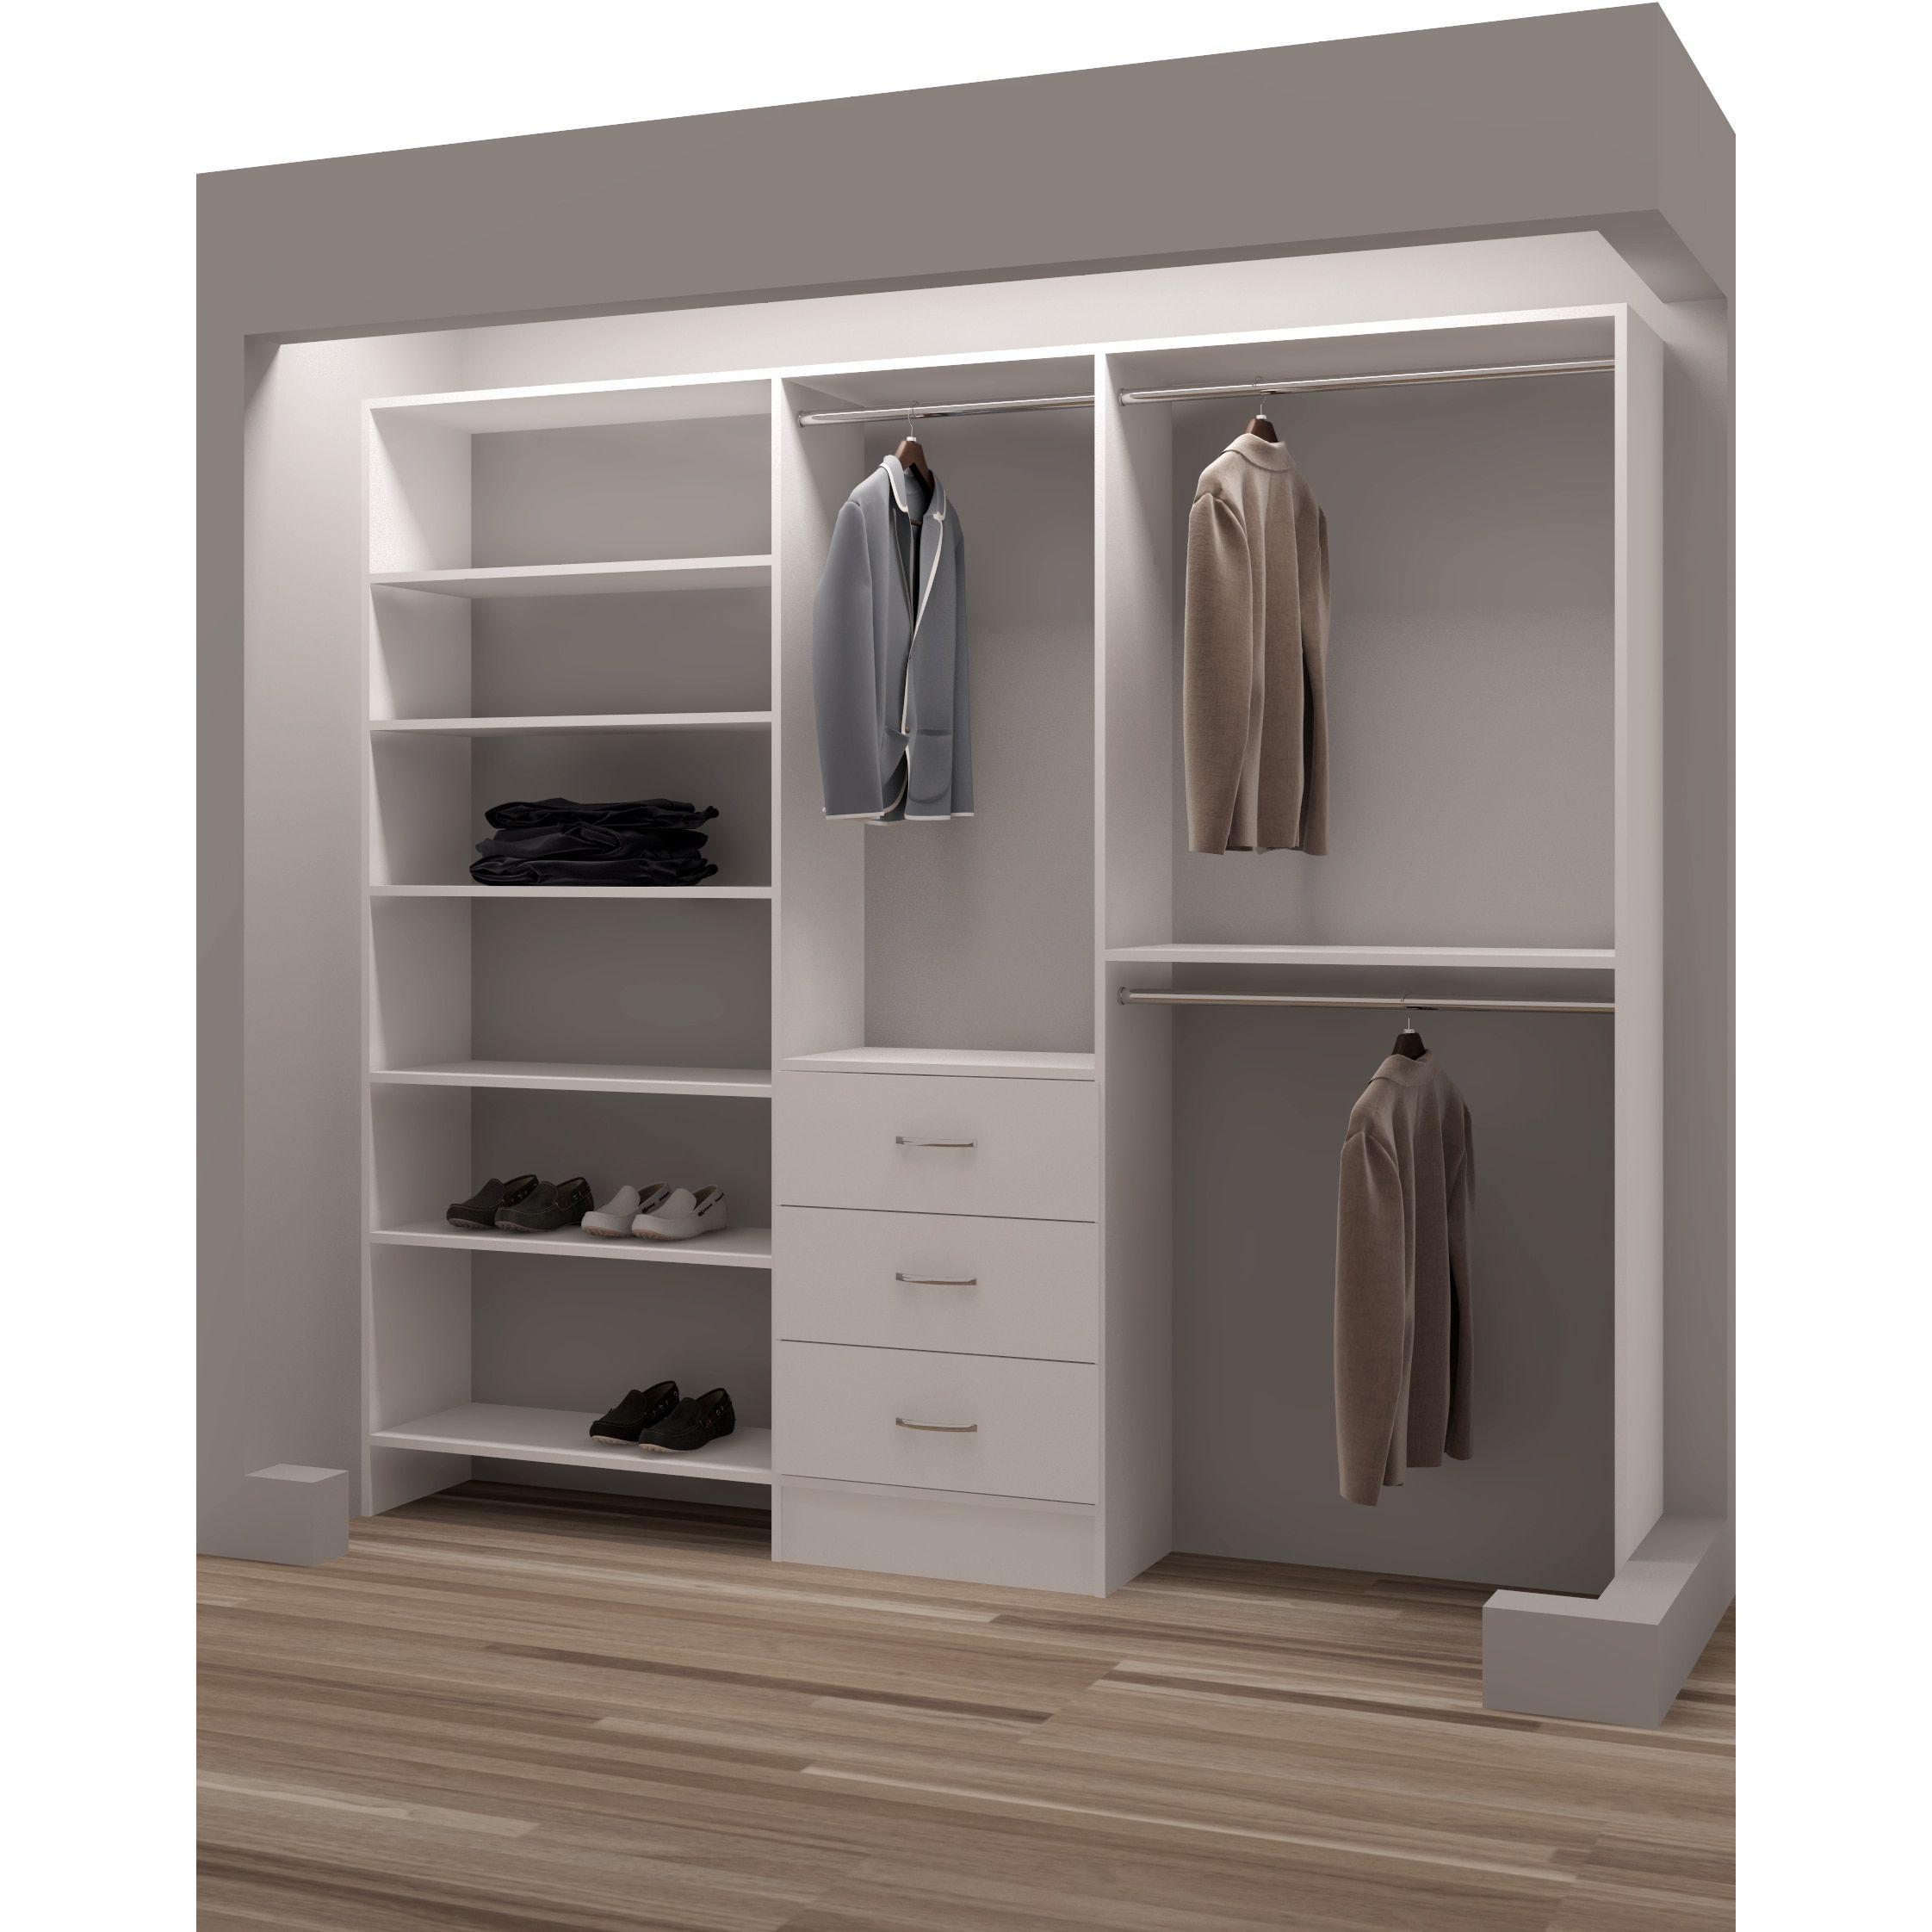 Closet Door Ideas Organizer Systems Wardrobe Sliding Doors Shelving Storage